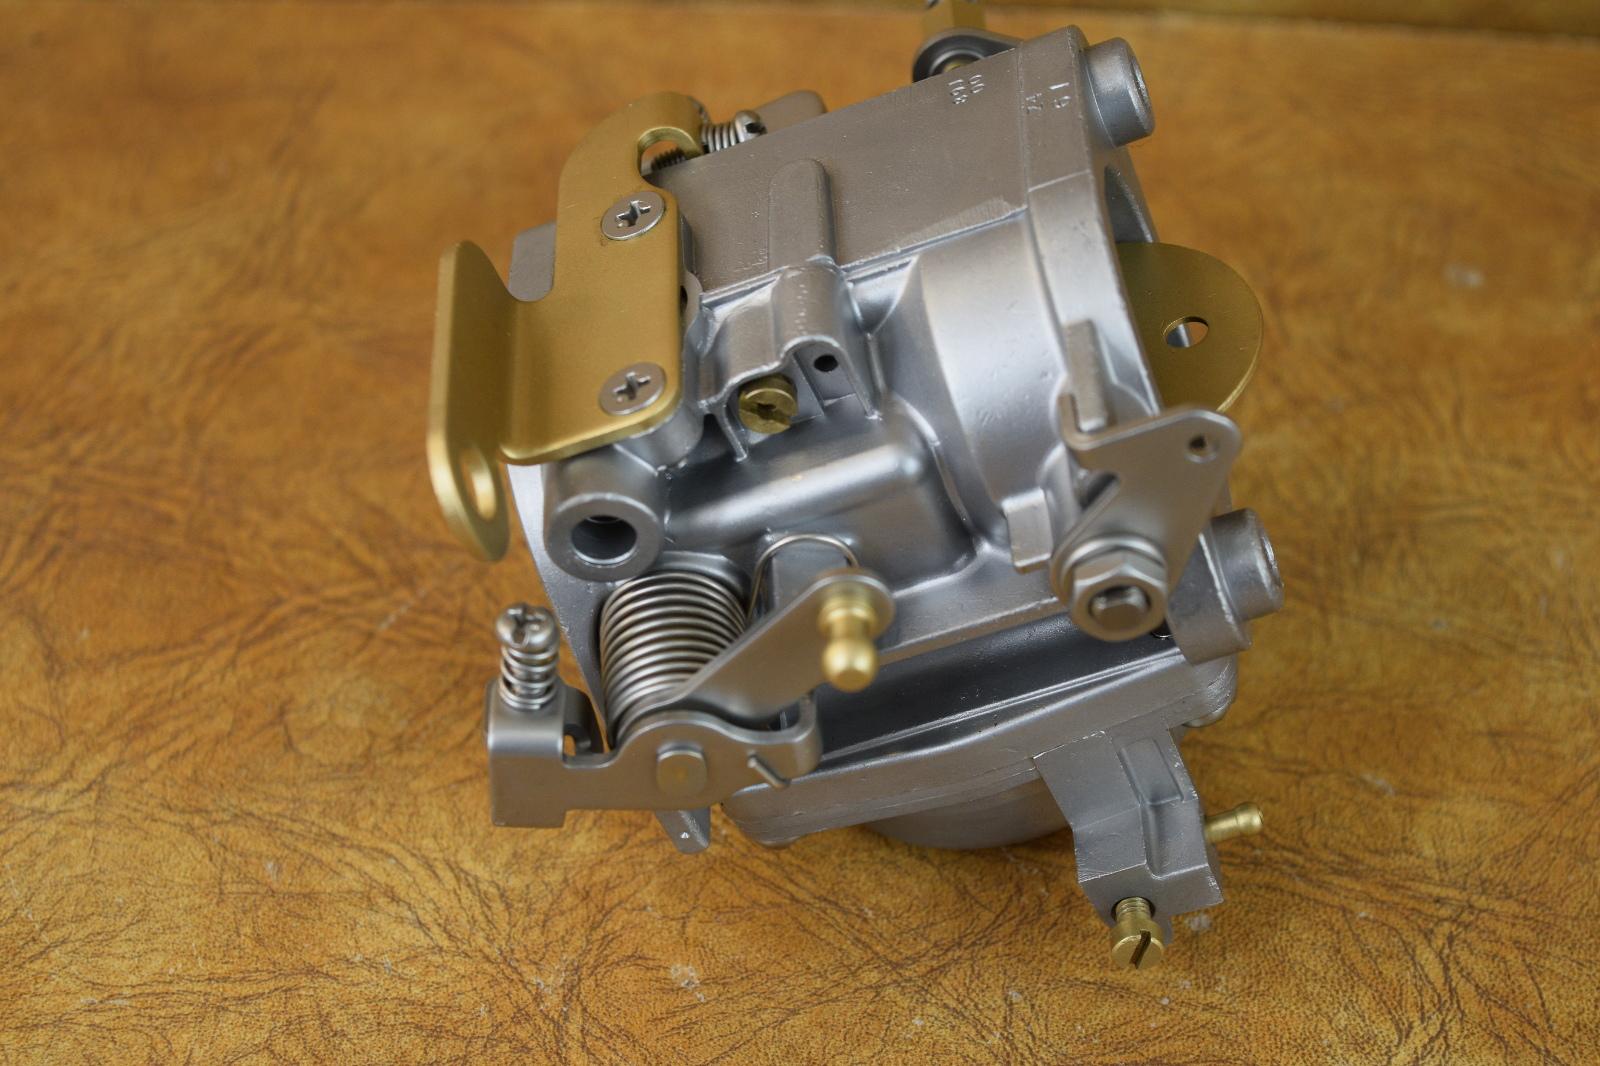 Evinrude 25 Hp Carburetor Related Keywords & Suggestions